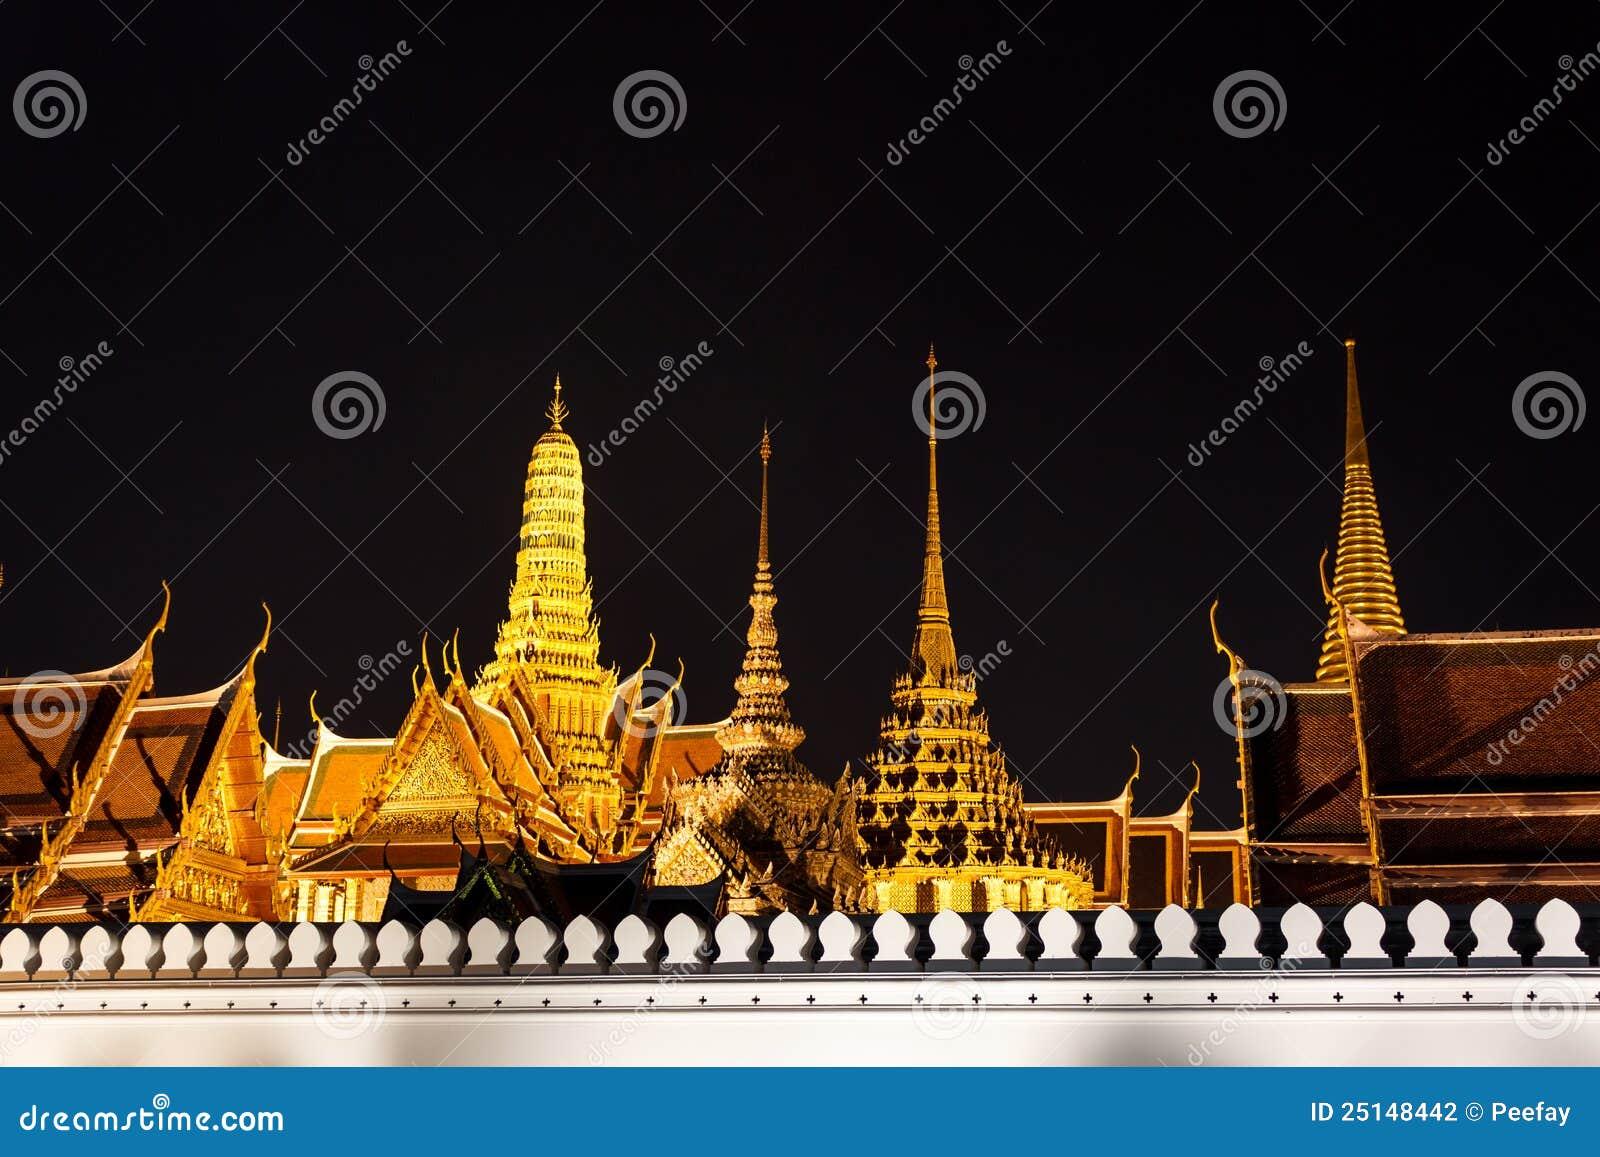 Wat Phra Kaew At Night Stock Photography - Image: 25148442